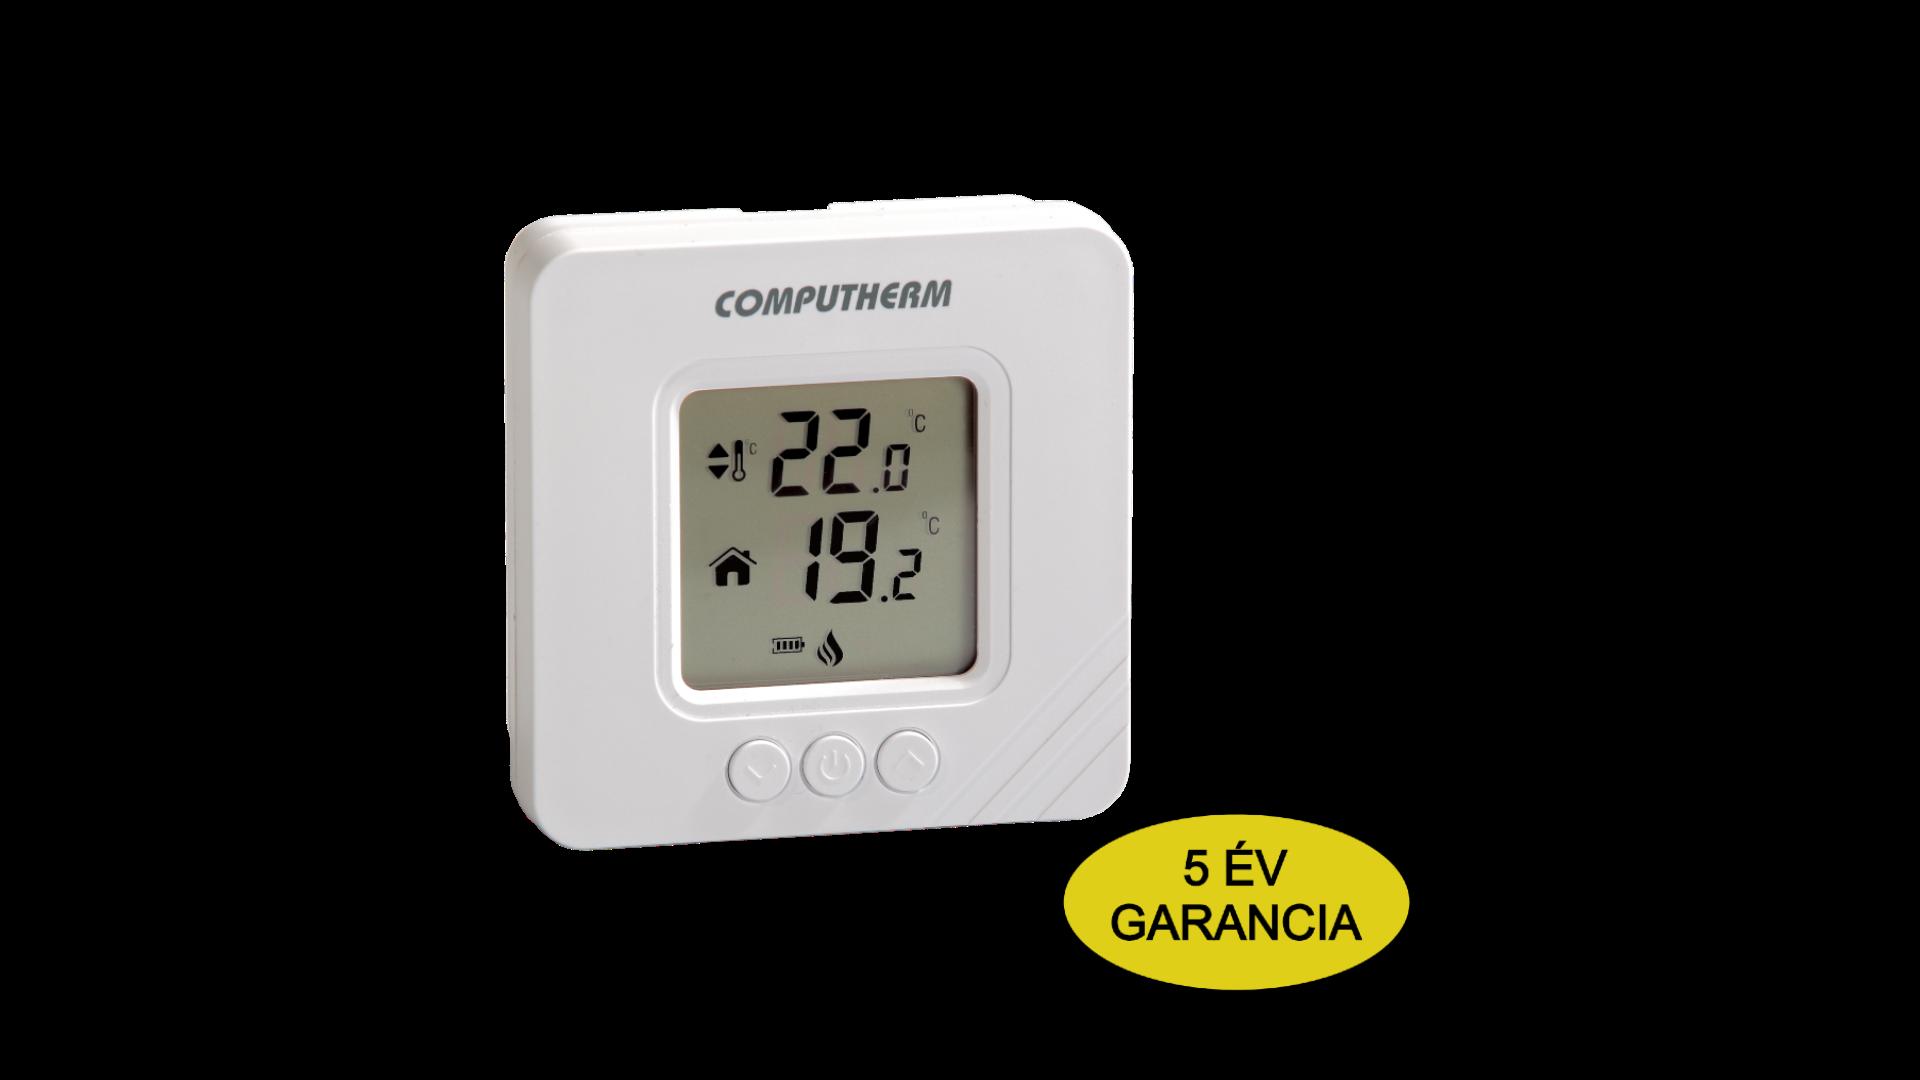 Computherm - Digitális termosztátok - COMPUTHERM T32 - Quantrax Kft.